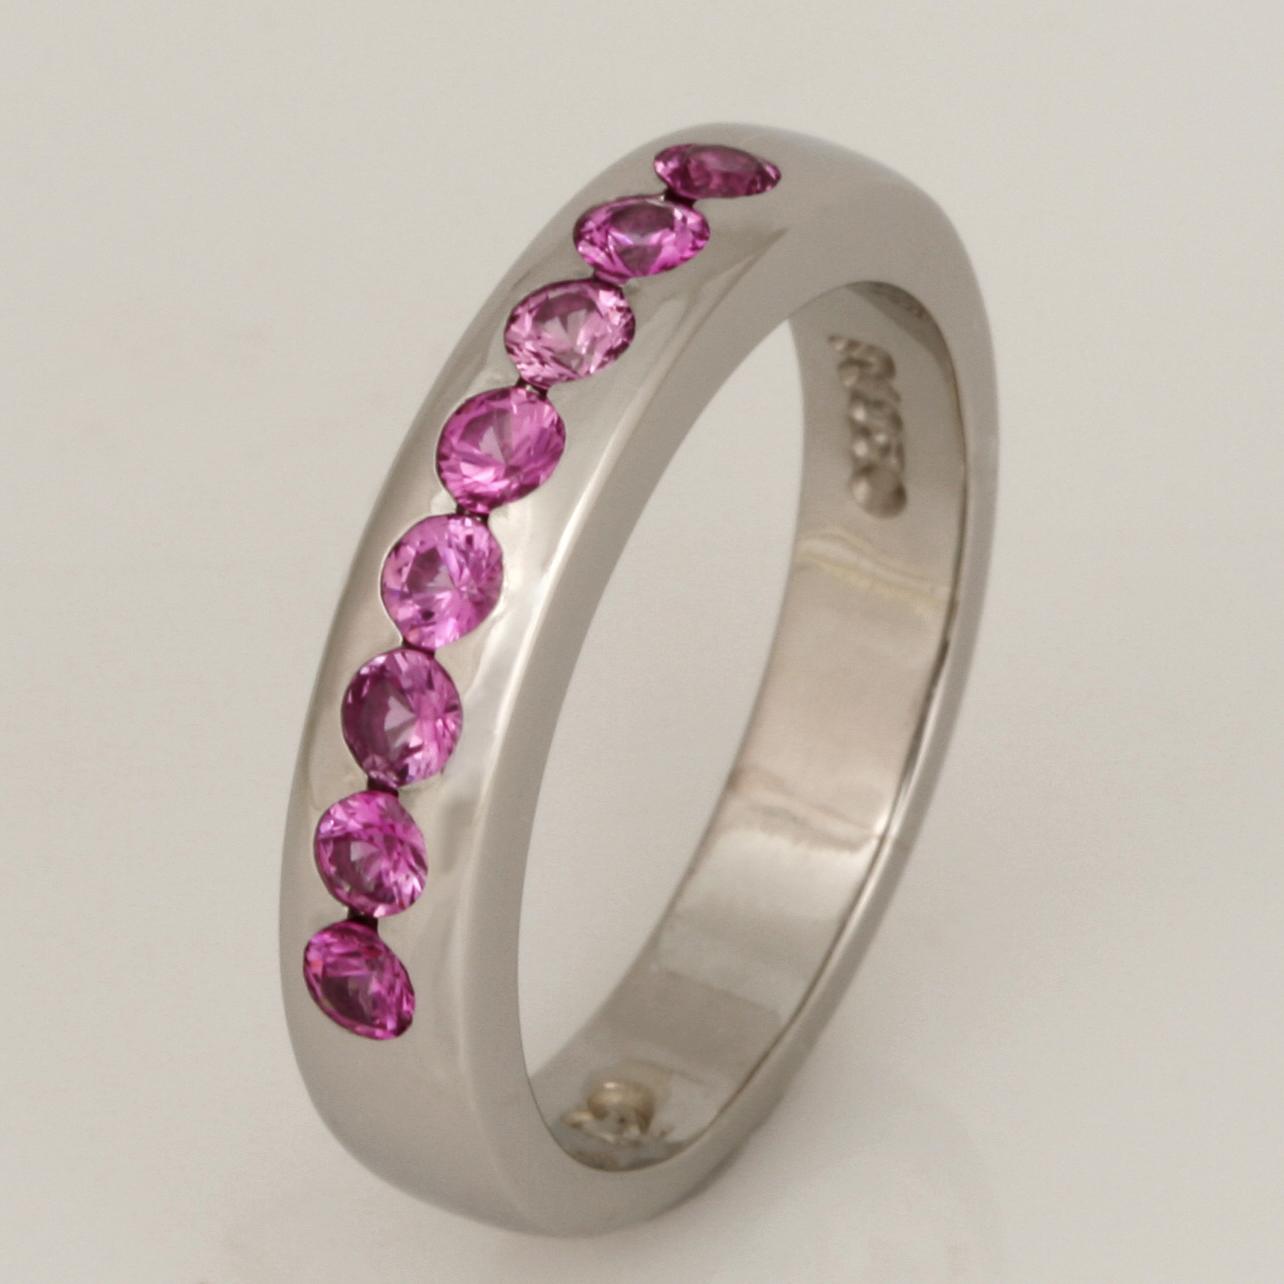 Handmade ladies palladium ring featuring pink sapphires